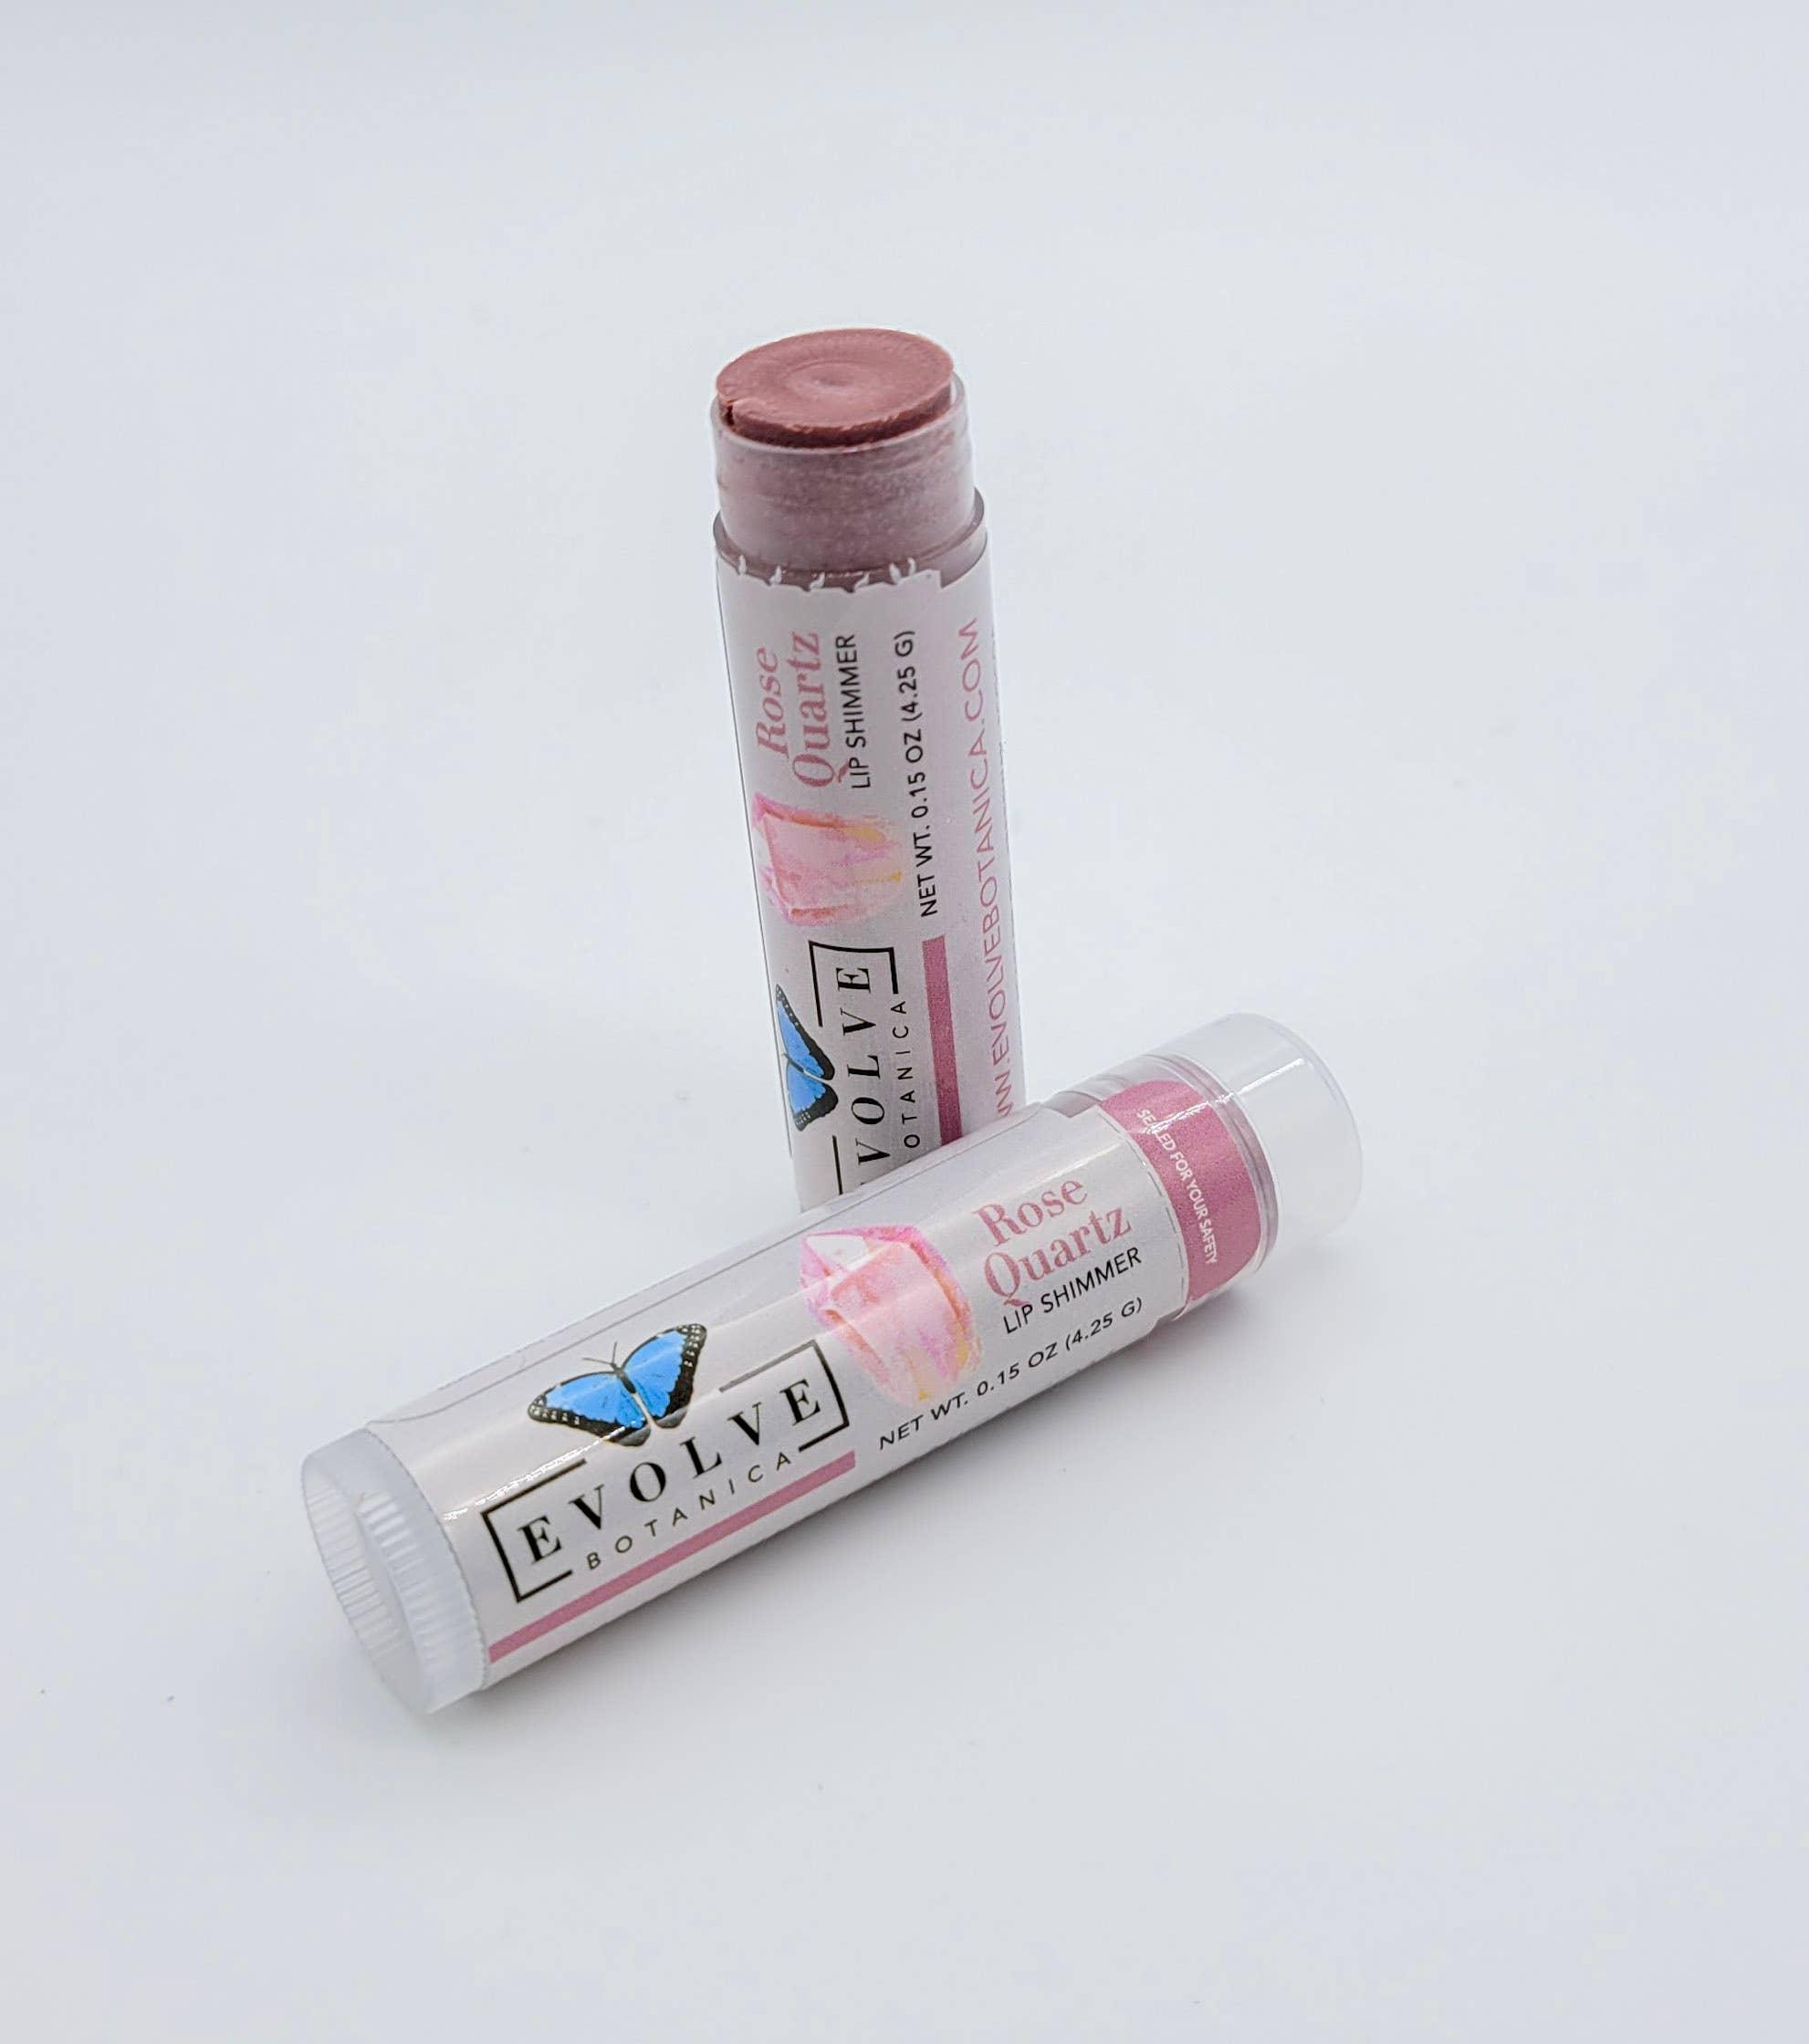 Evolve - Lip Balm - Natural Shimmer Tint - Rose Quartz | Trada Marketplace